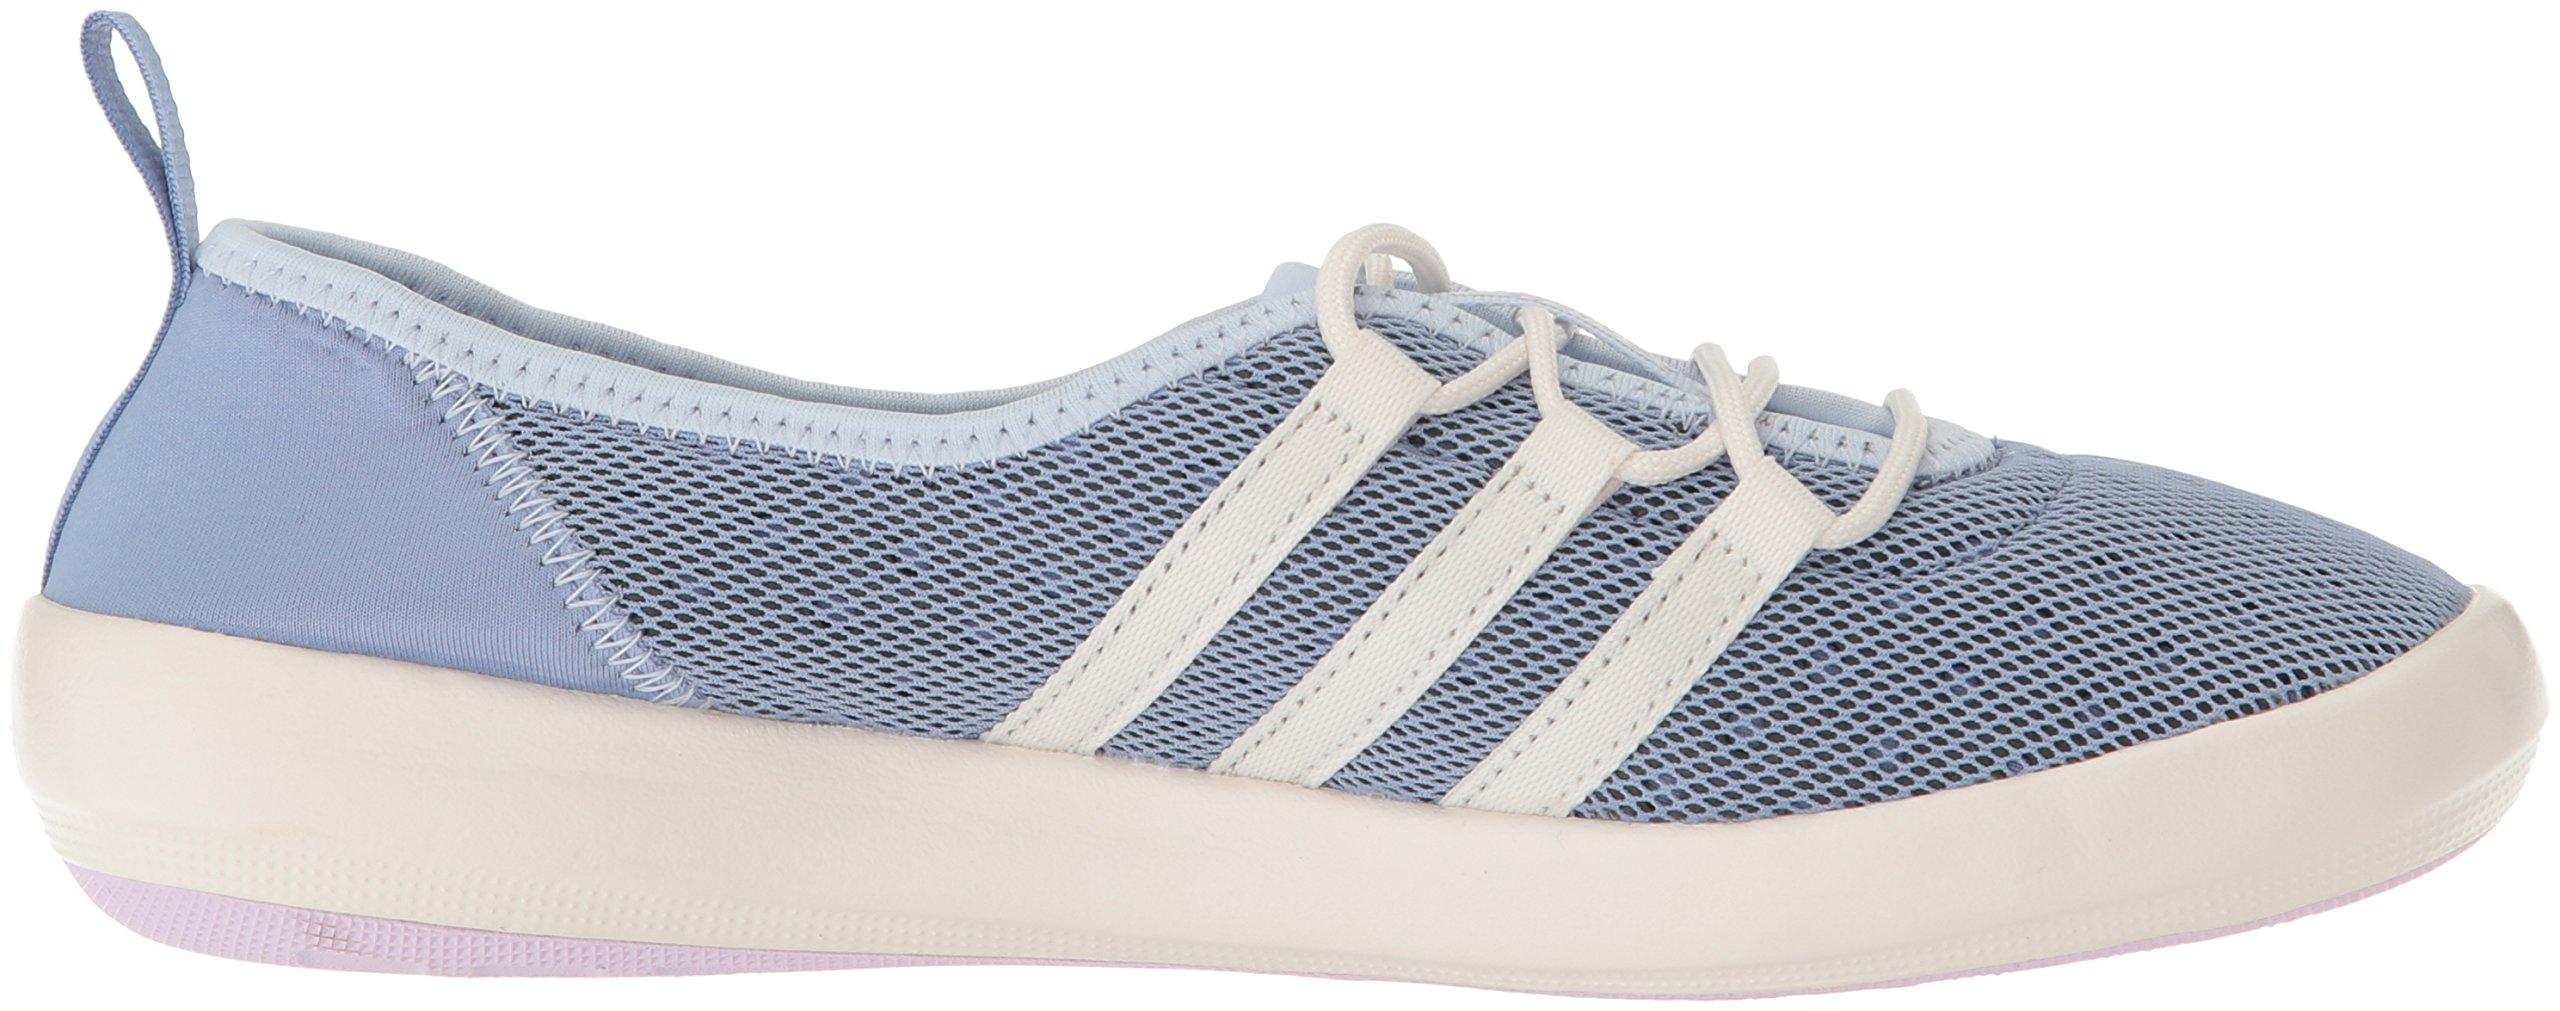 online store f6732 6a218 Details about adidas outdoor Women's Terrex CC Boat Sleek Walkin - Choose  SZ/color